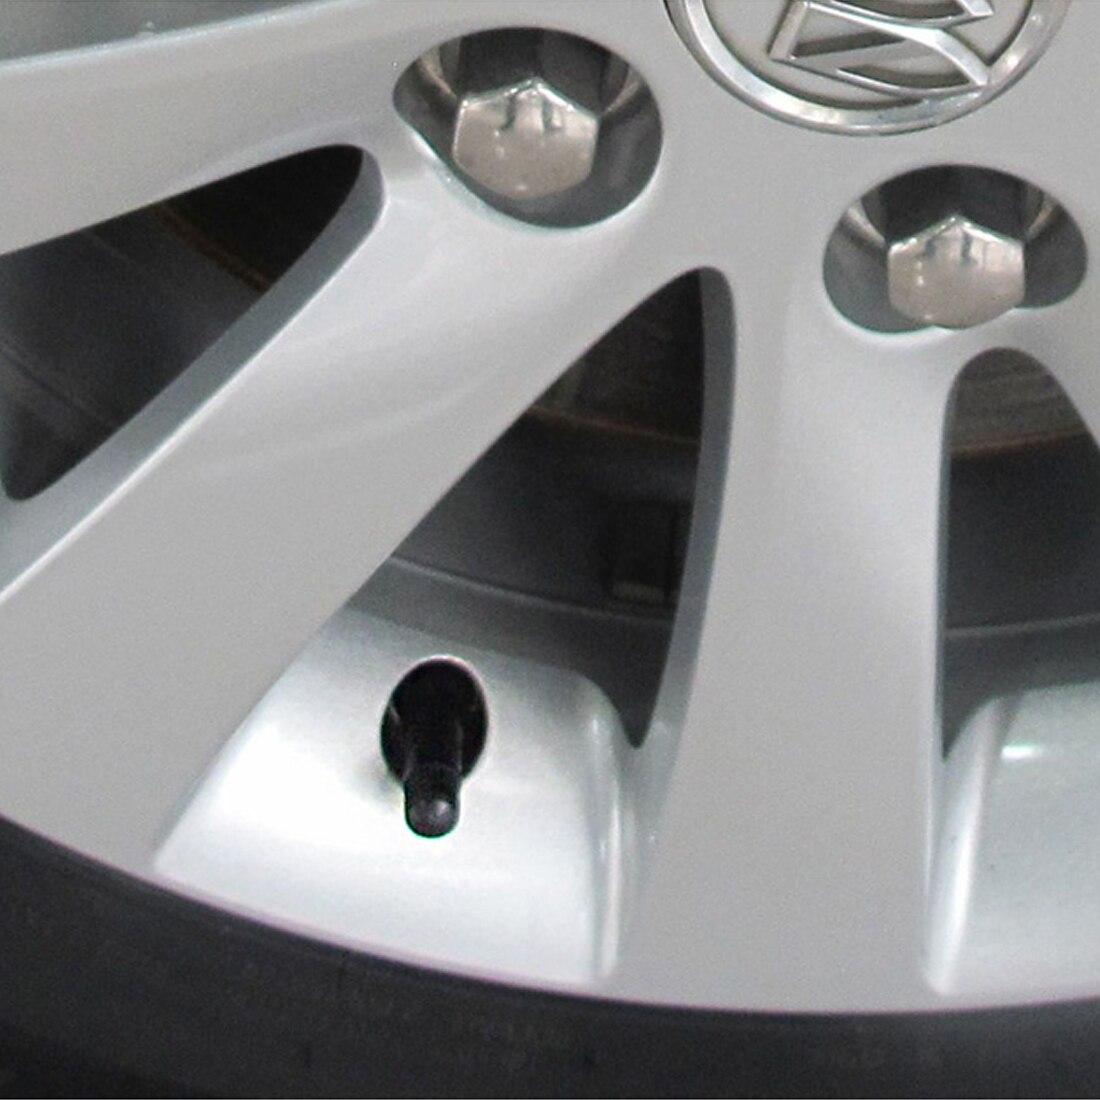 Dewtreetali super bieten Sensor Ventil Stem 4Pcs TPMS Tire Pressure Monitoring System Anti-explosion Snap In Reifen Ventil vorbauten Snap